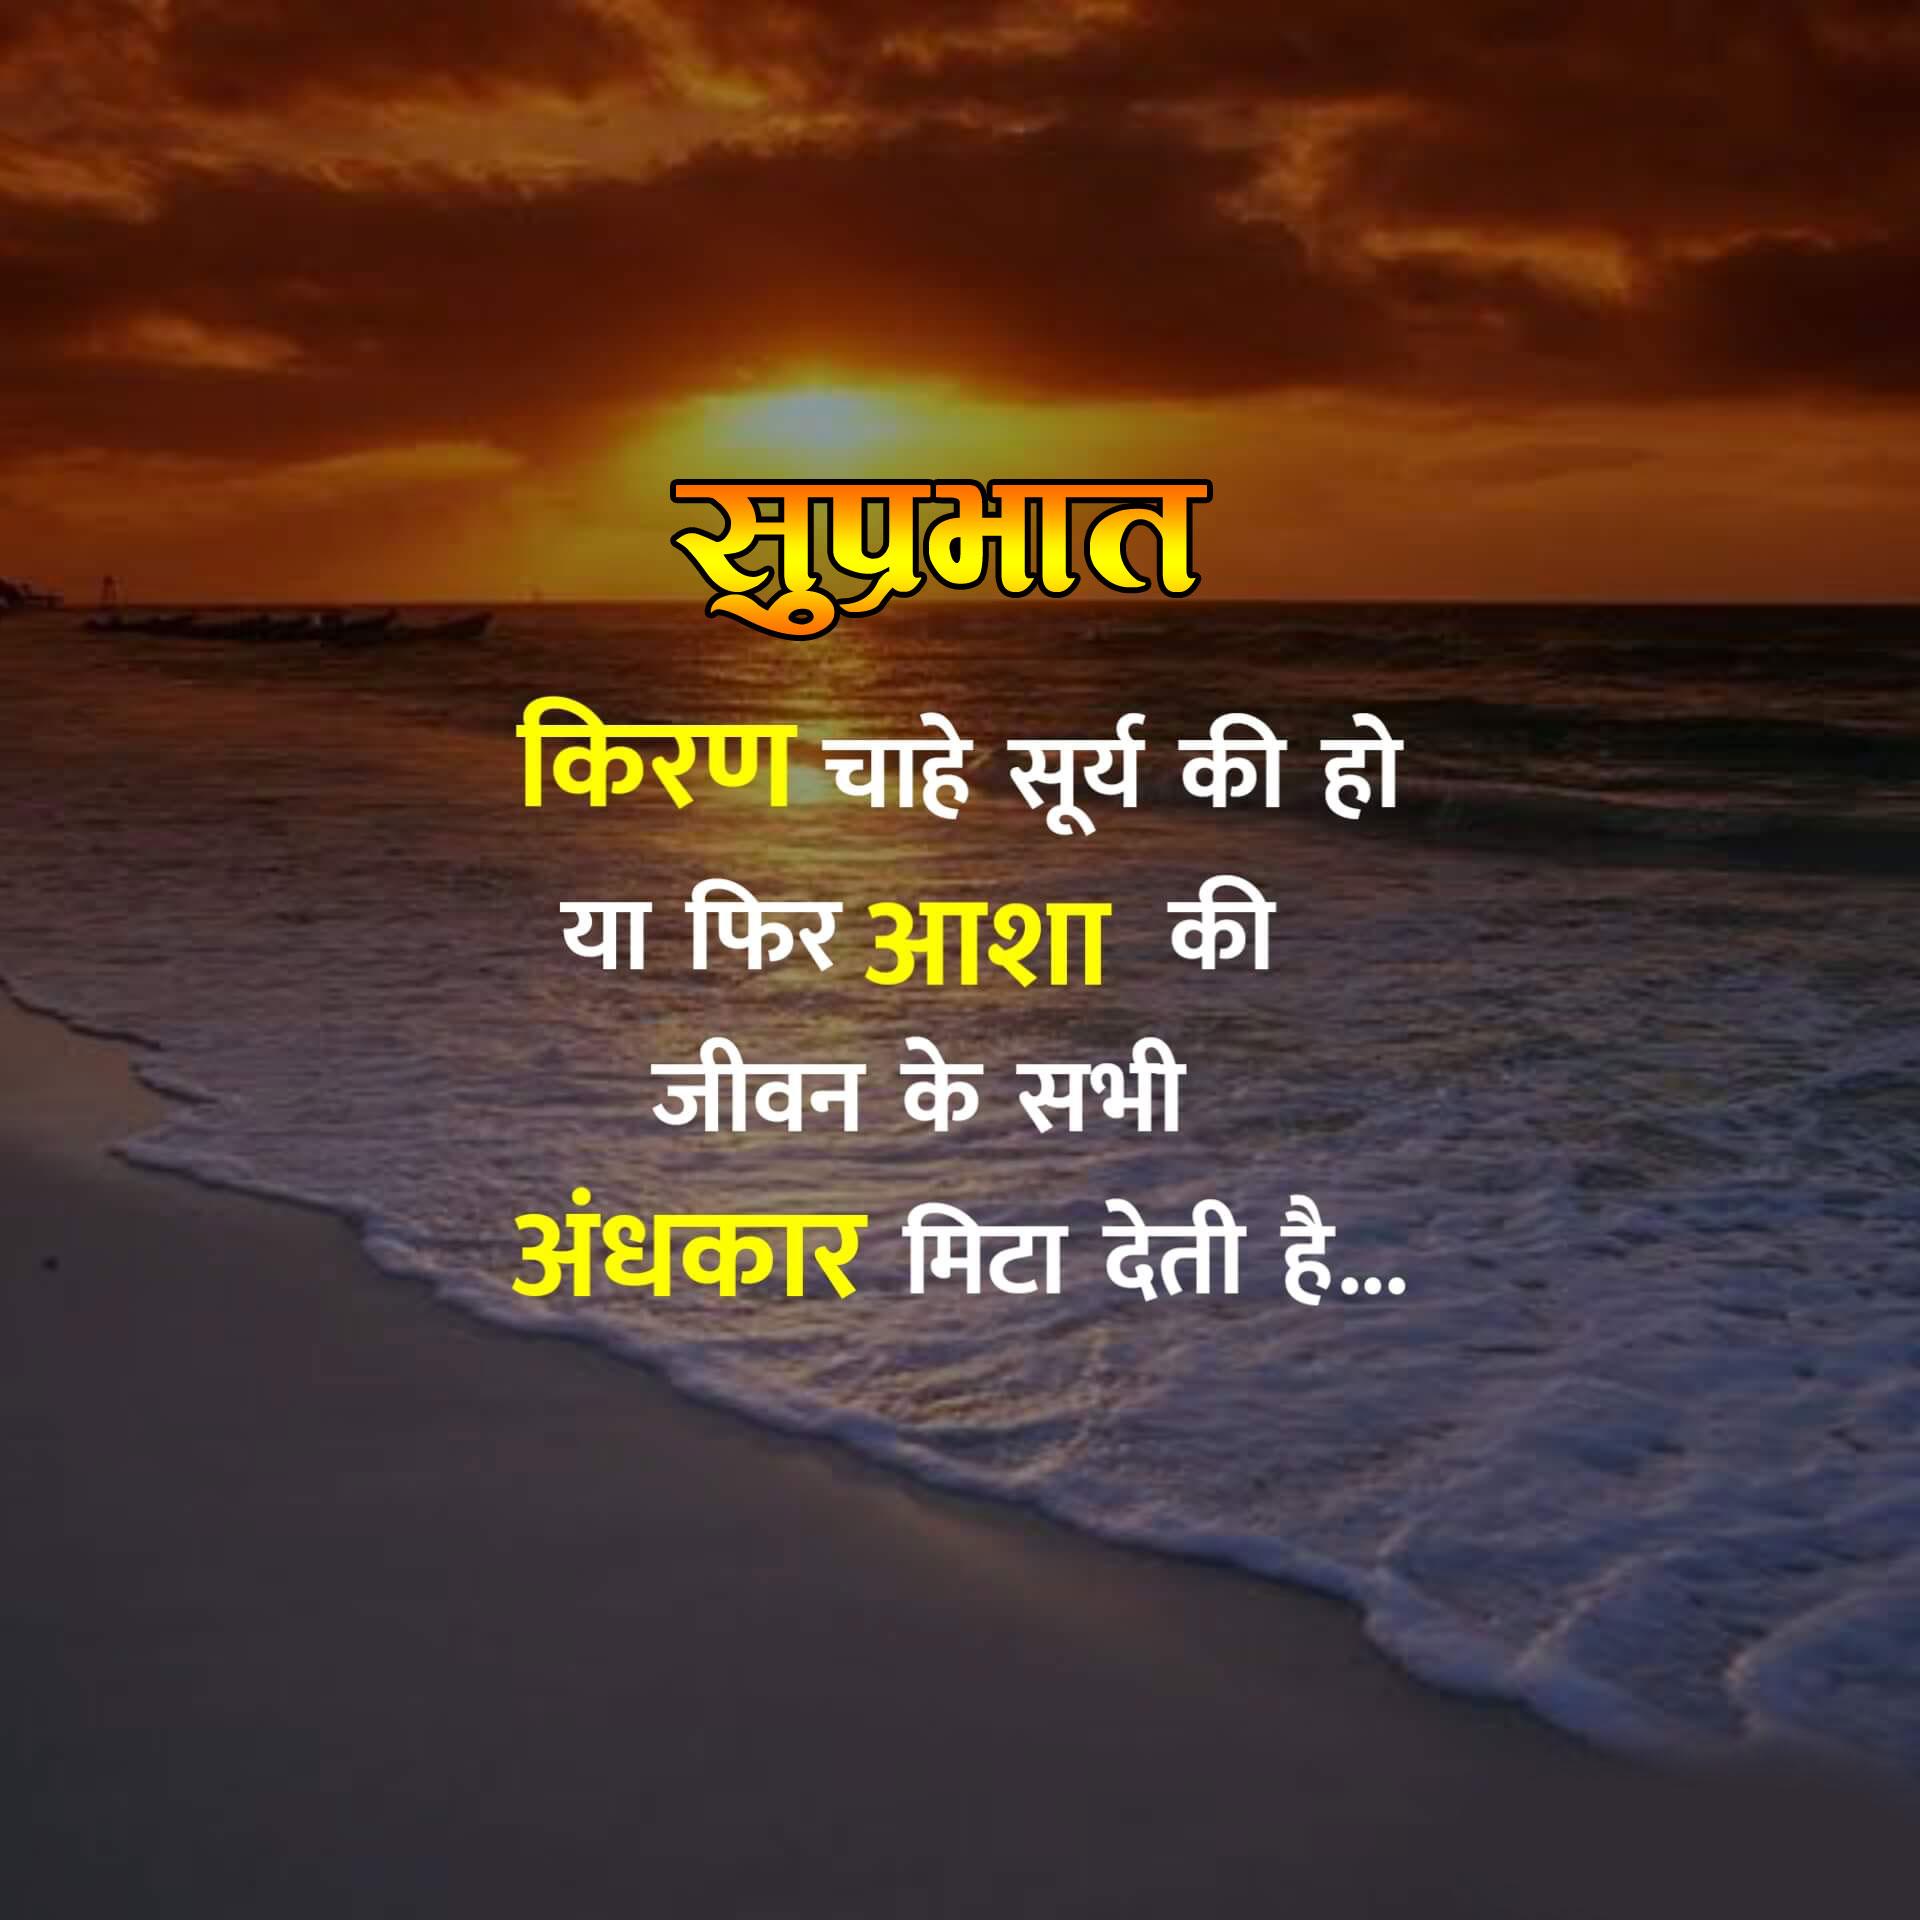 New Beautiful Suprabhat Images wallpaper photo download